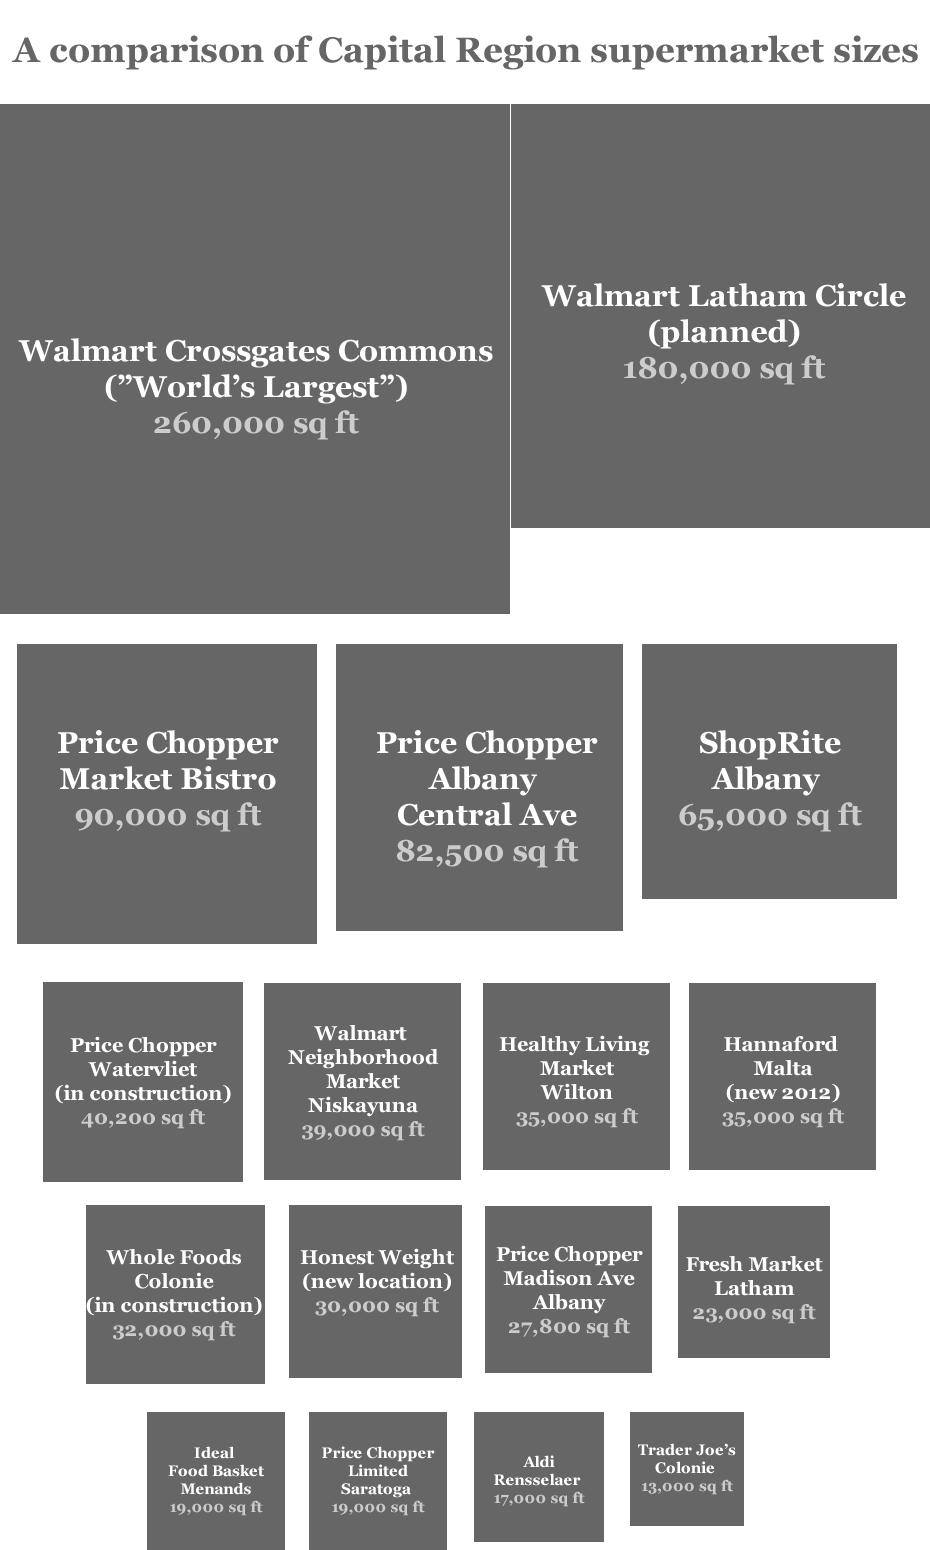 capital region supermarket size comparison